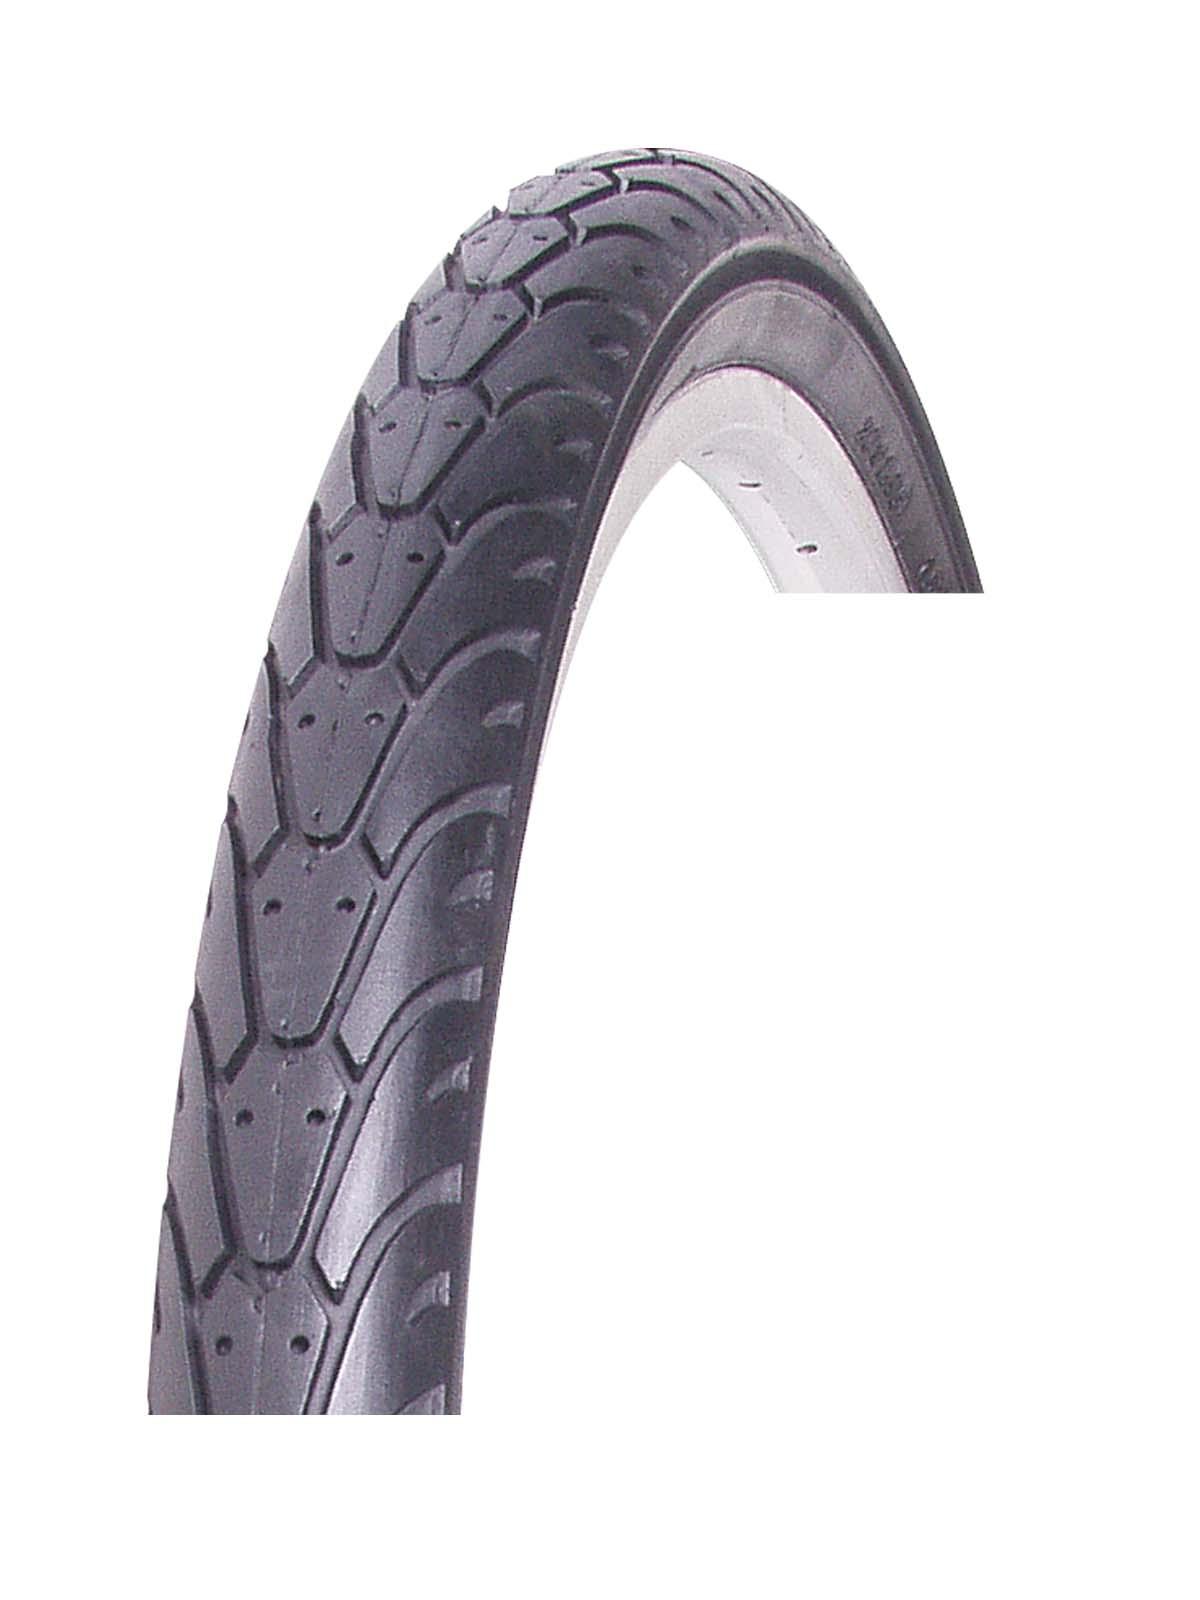 VEE RUBBER - Външна гума Vee Rubber 24x1,75 VRB212